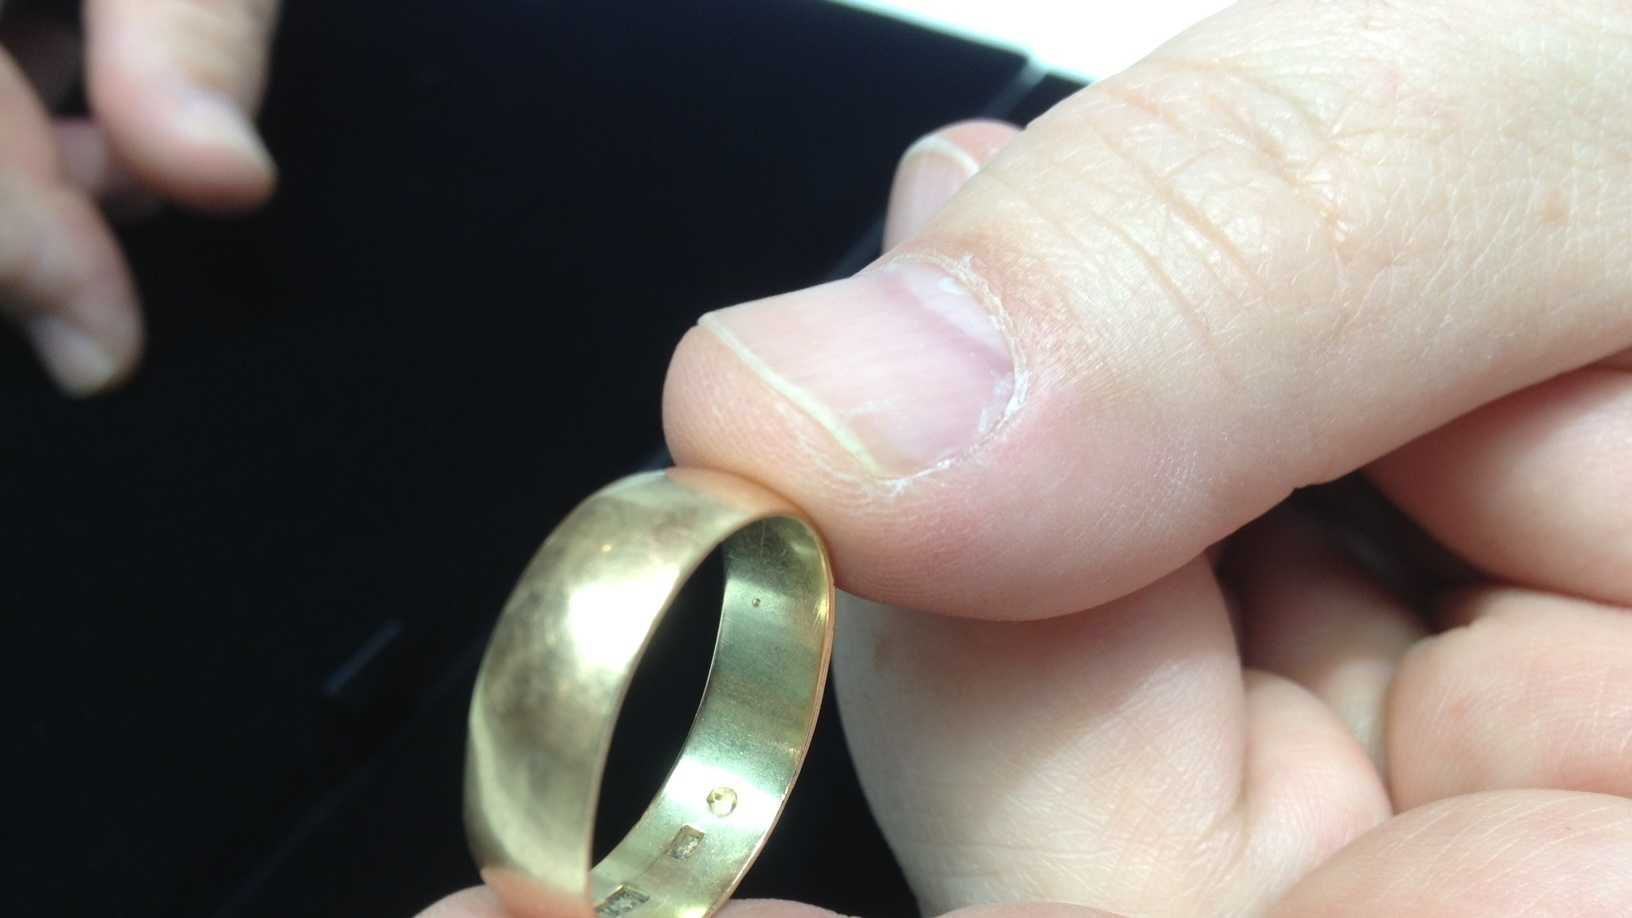 01-Oswald-wedding-ring.JPG